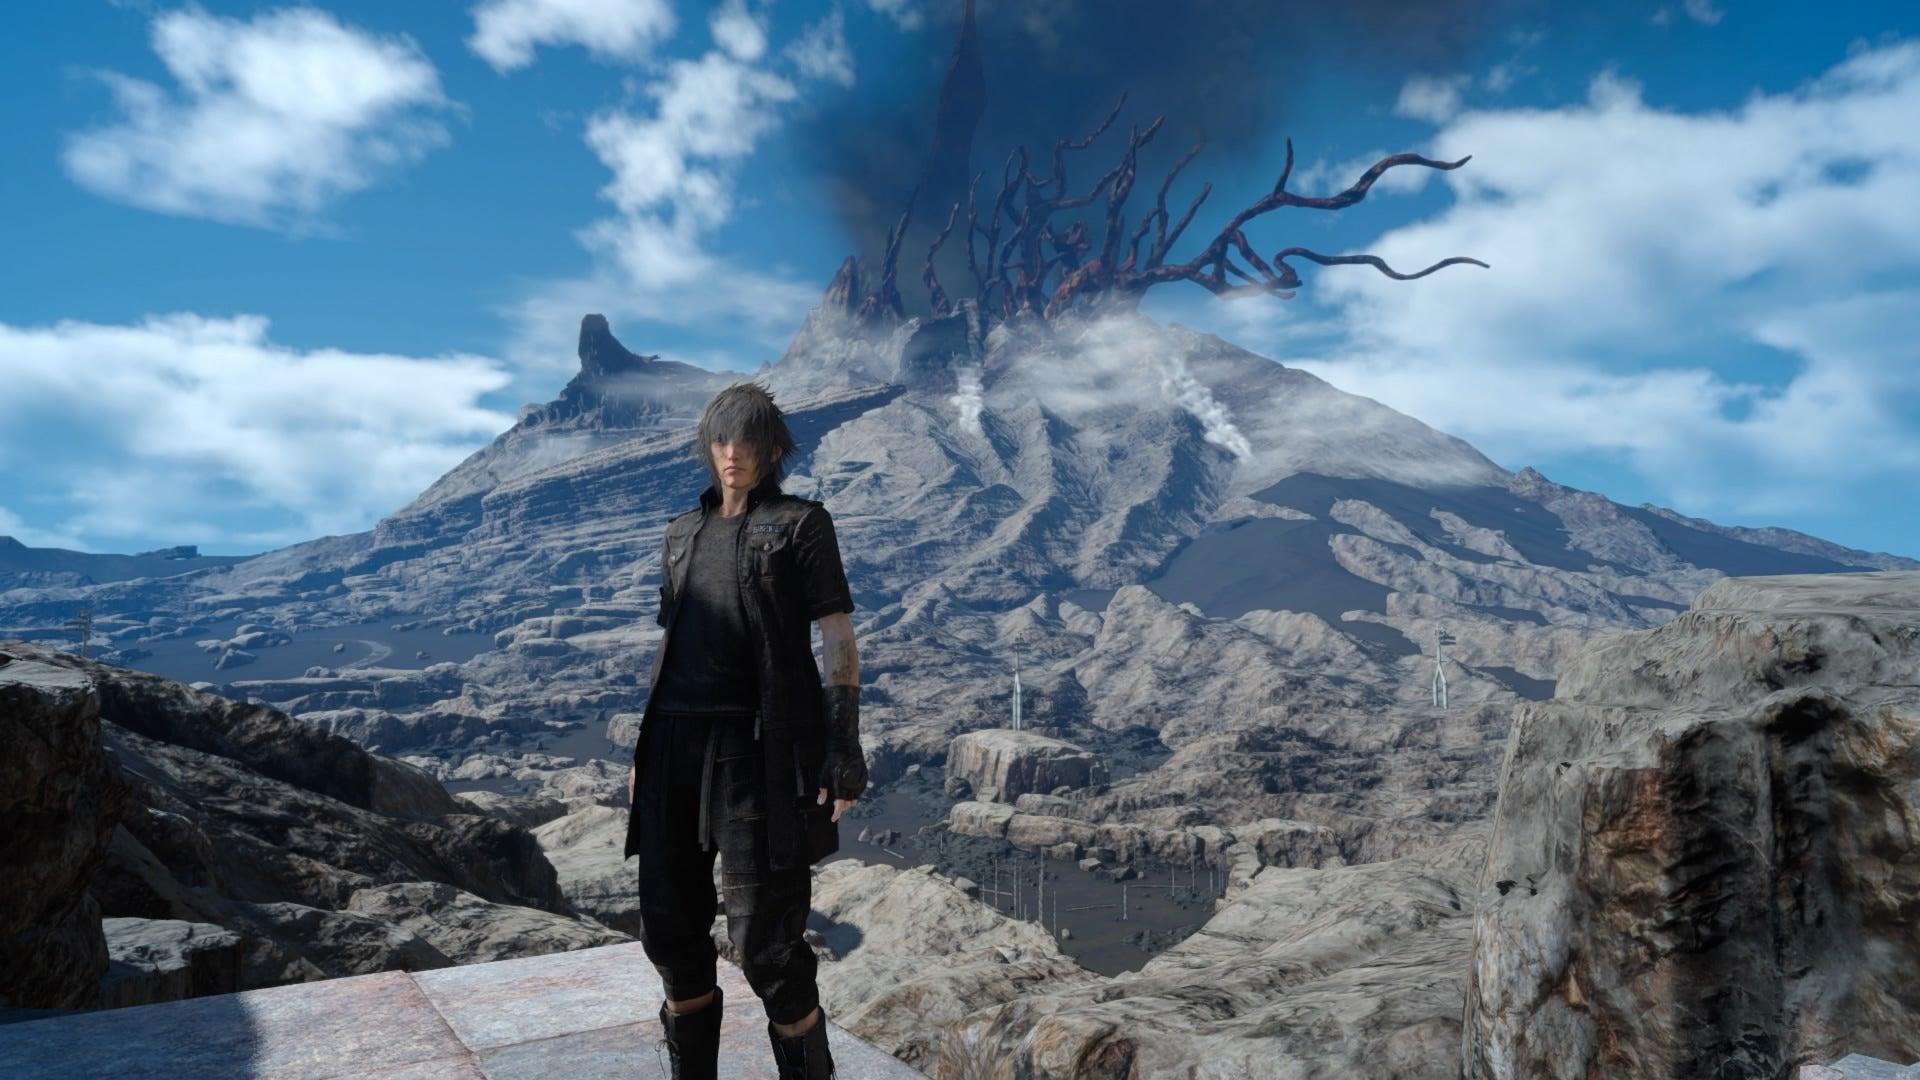 Final Fantasy 15Gets New Game Plus Next Week